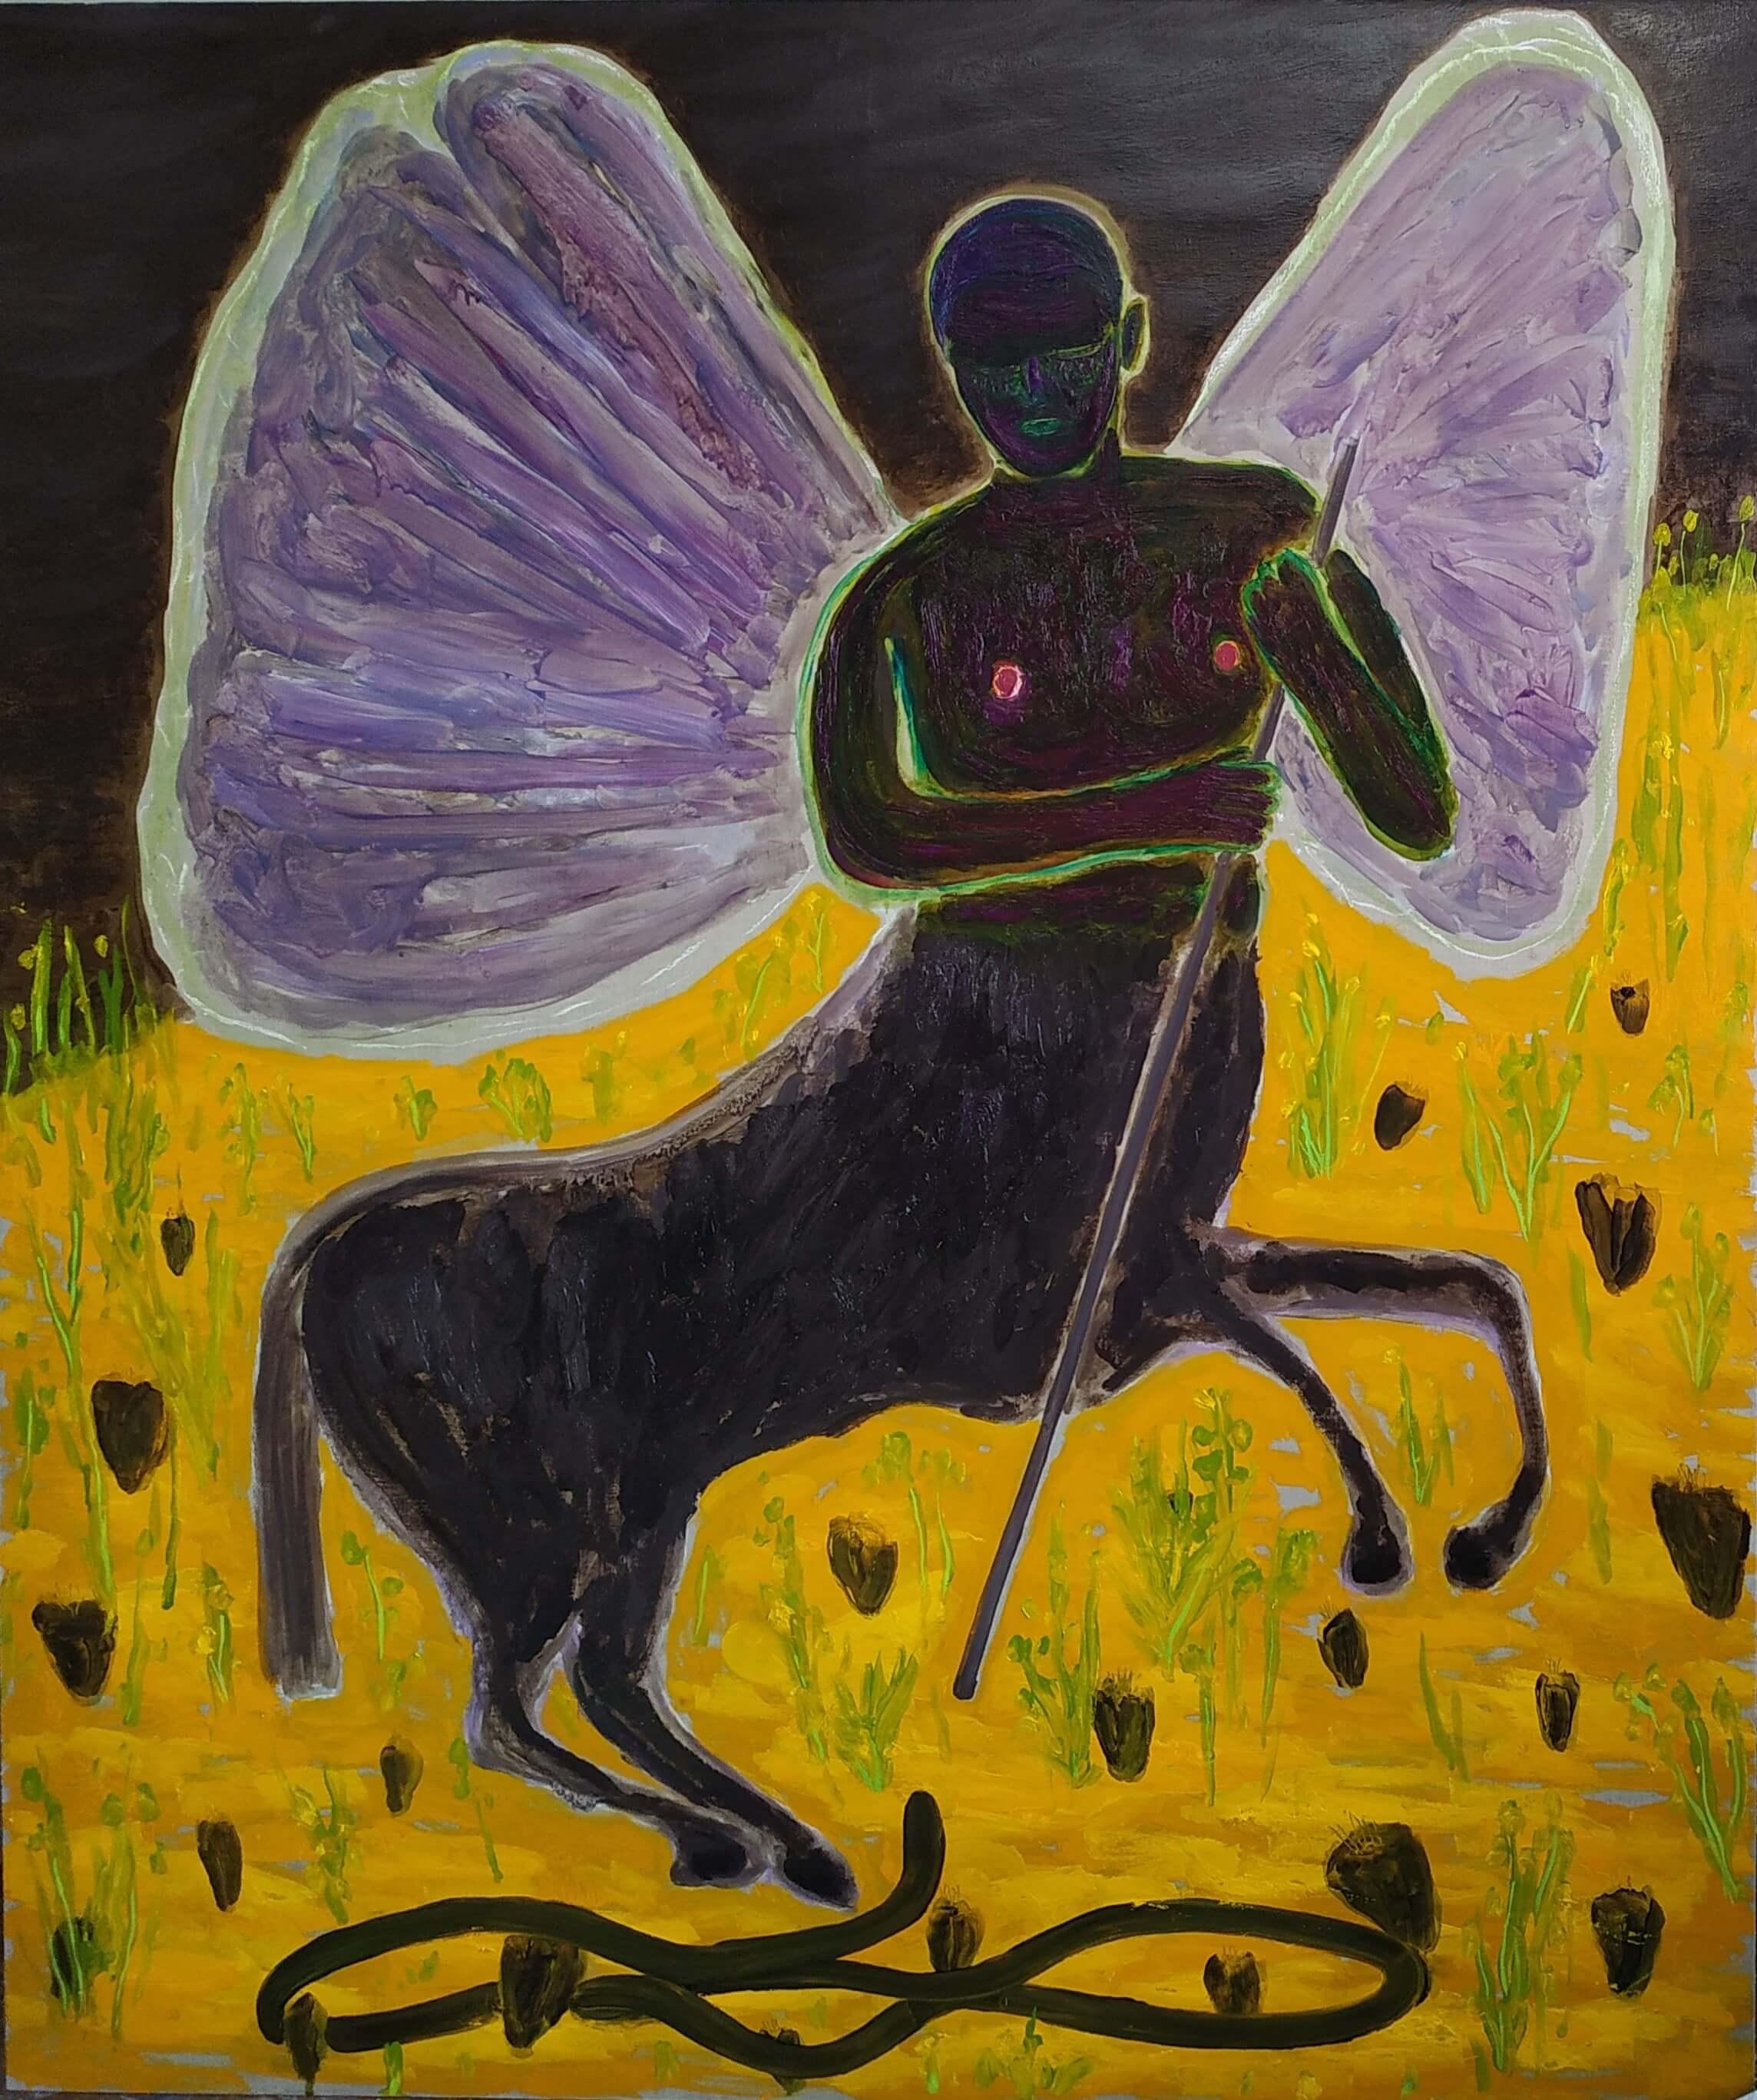 Grgur-Akrap-Dream-153-x-117cm-oil-on-canvas-2020.